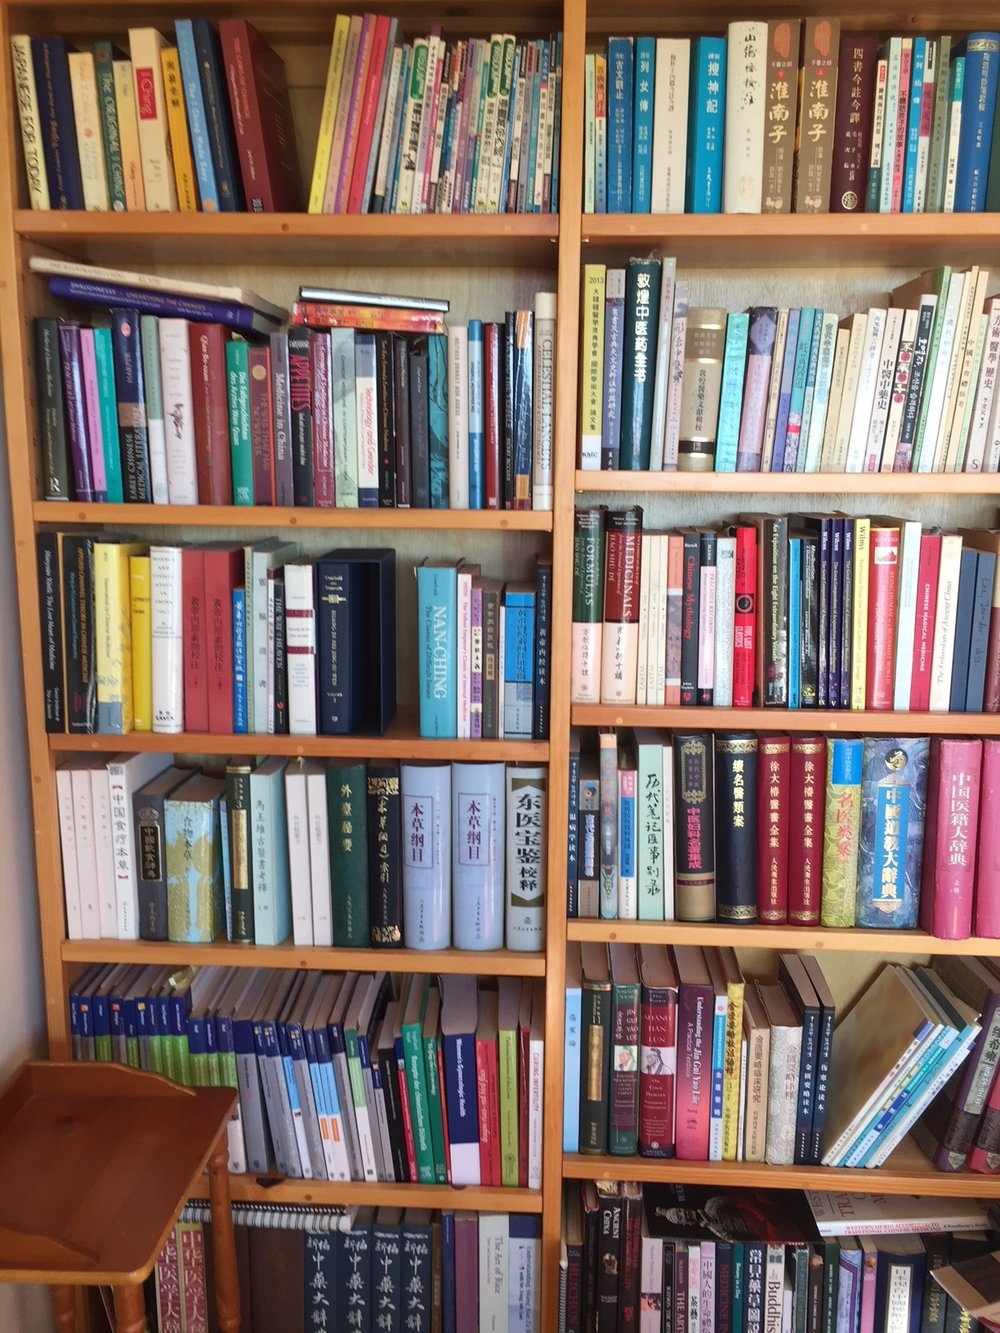 One of my favorite bookshelves